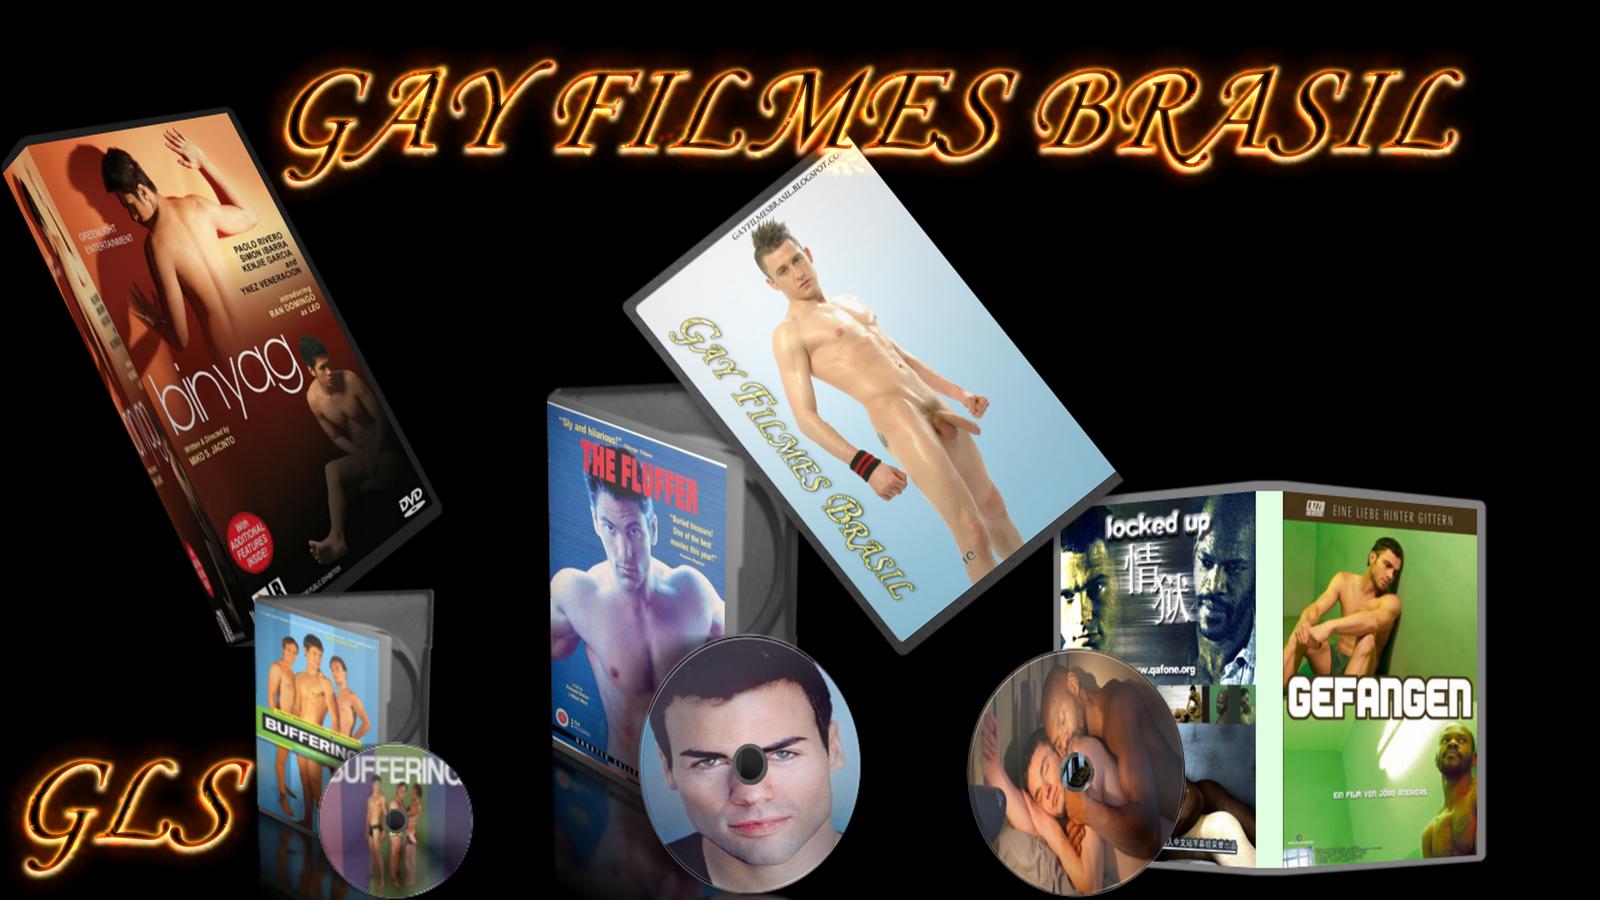 Gay--_--Filmes--_--Brasil - GLS